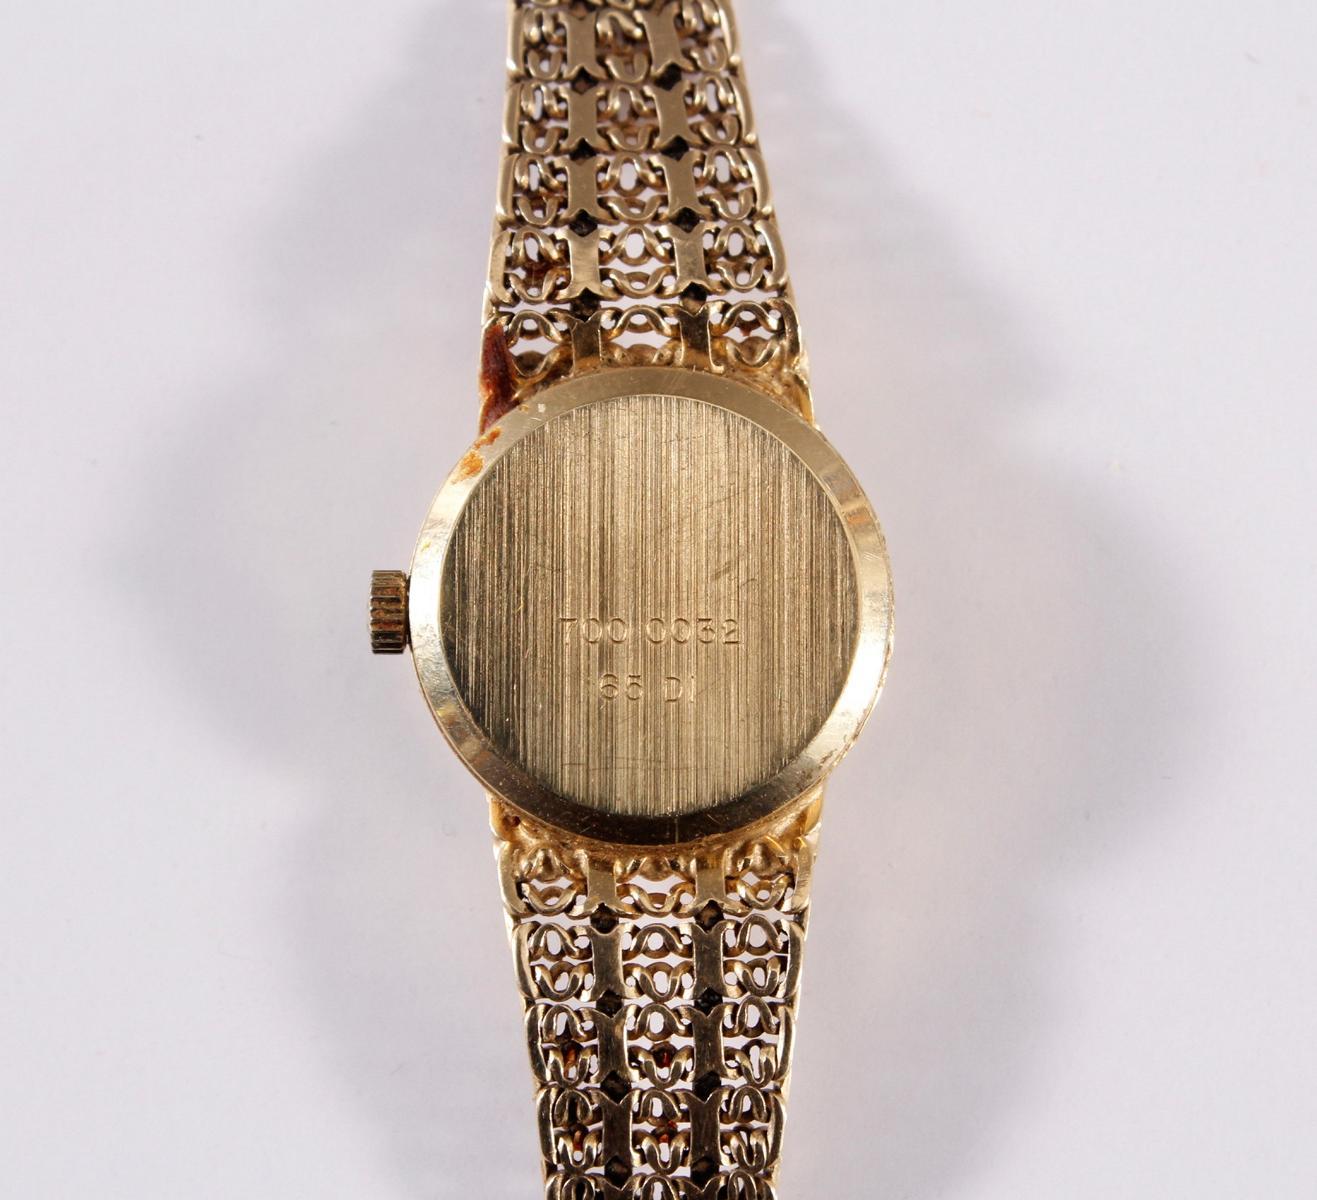 Damenarmbanduhr der Marke Sertina, 14 kt Gelbgold-5